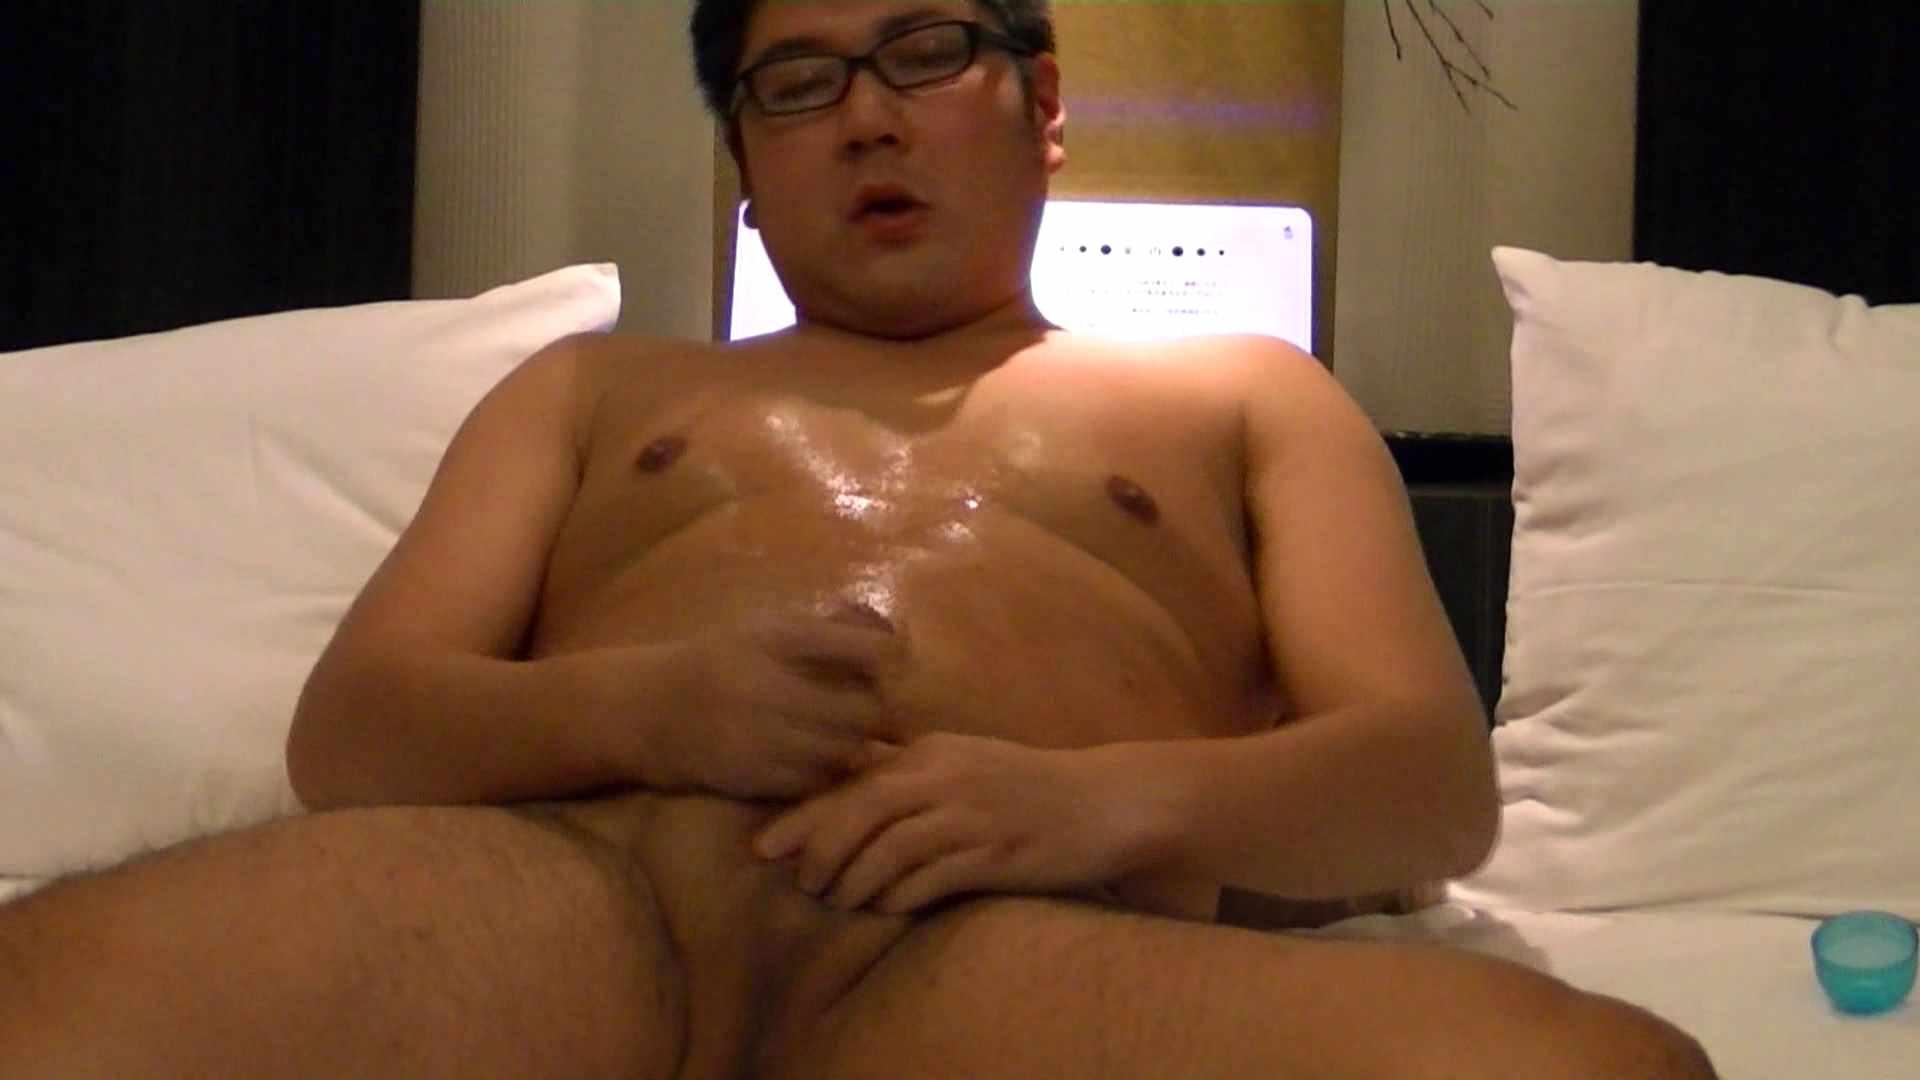 Mr.オナックスさん投稿!HD 貴方のオナニー三万円で撮影させてください。VOL.03 後編 オナニー編 ゲイAV画像 106枚 62